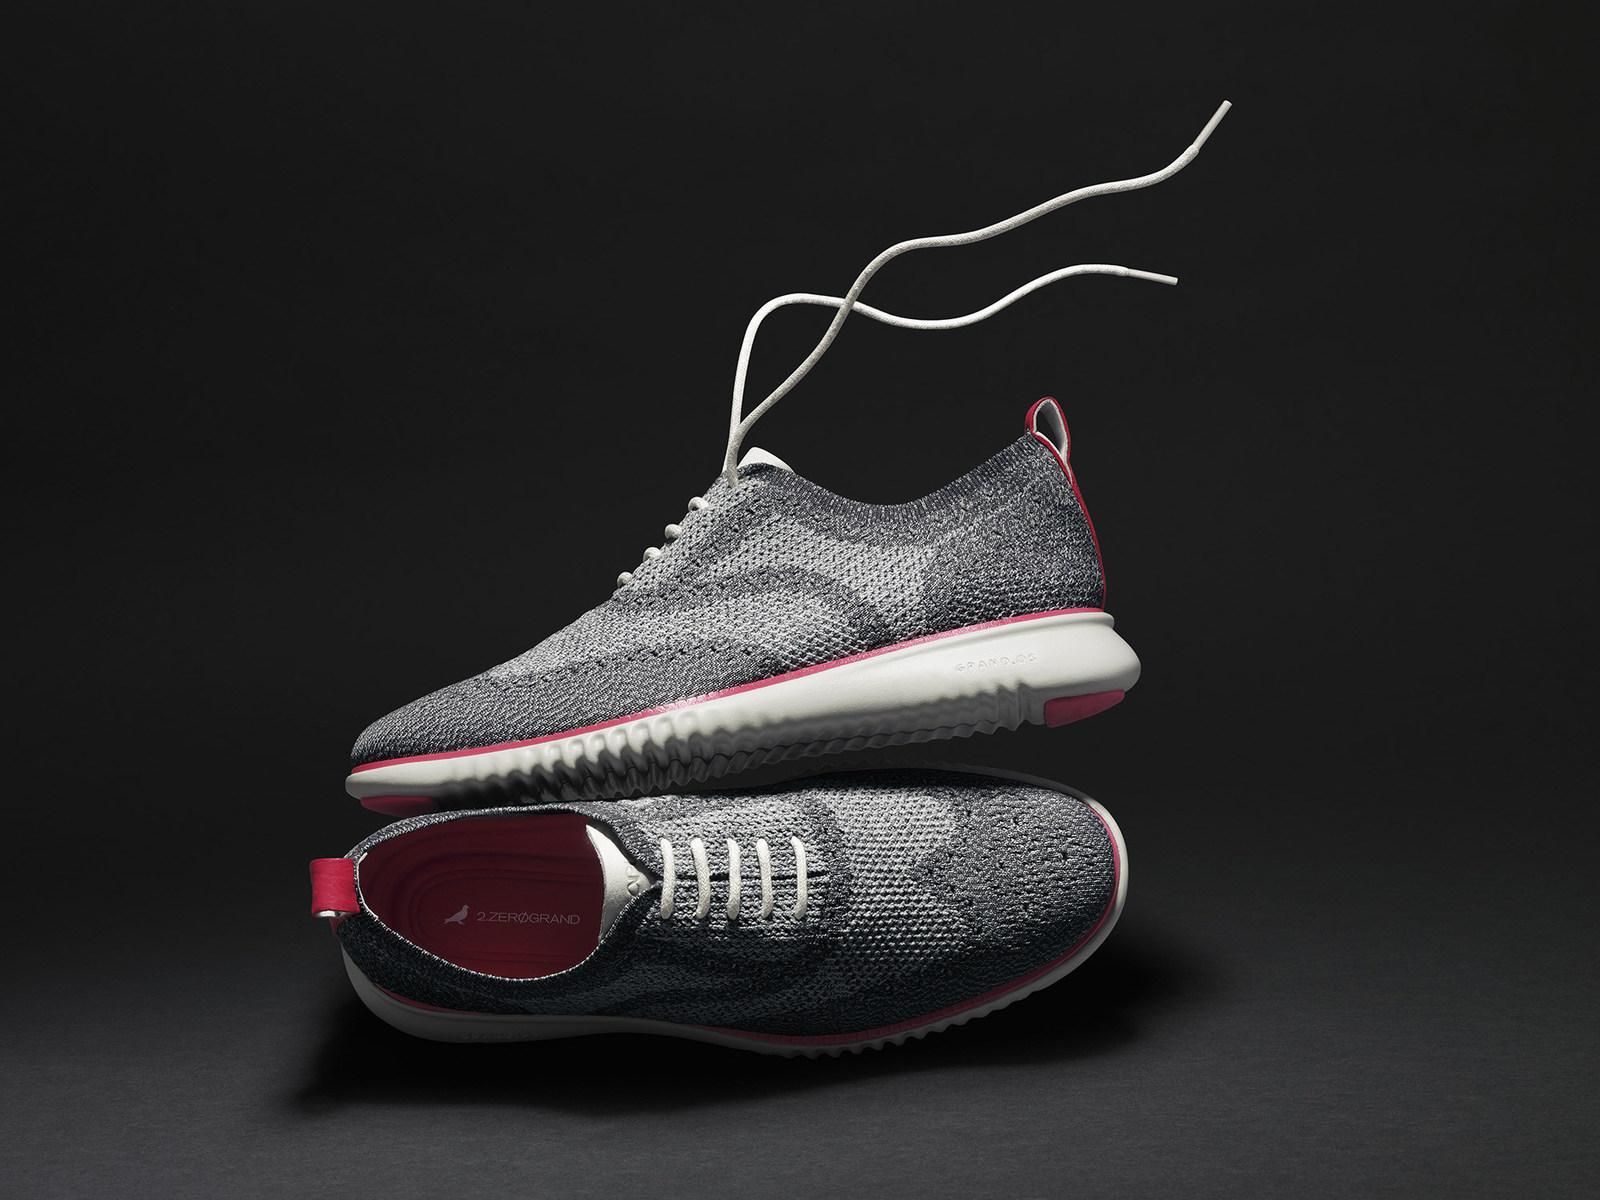 Cole-Haan-Stitchlite-x-Staple-Design-Sneaker-1